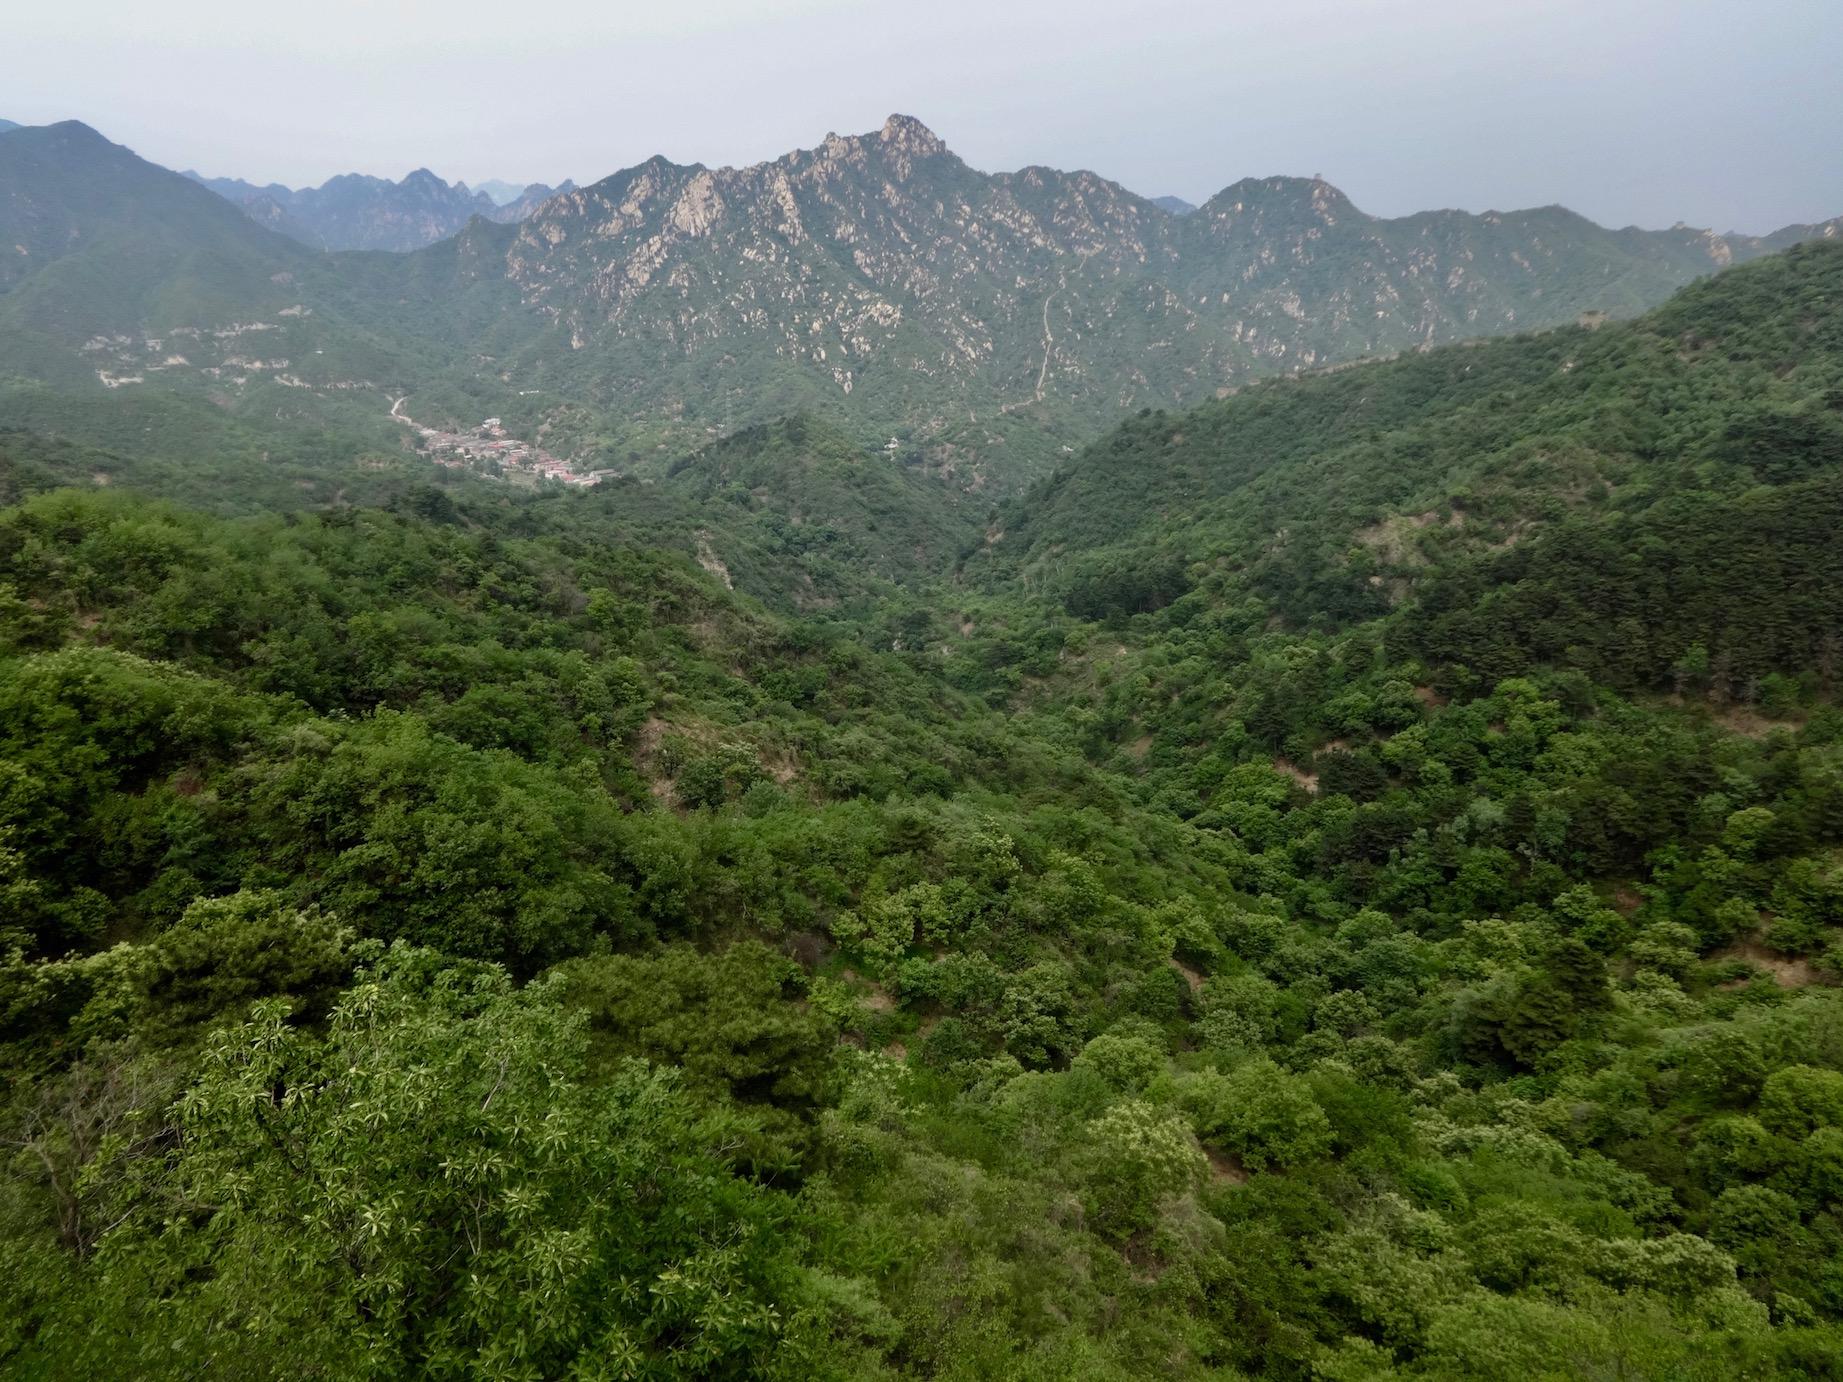 Mountain views Mutianyu The Great Wall of China